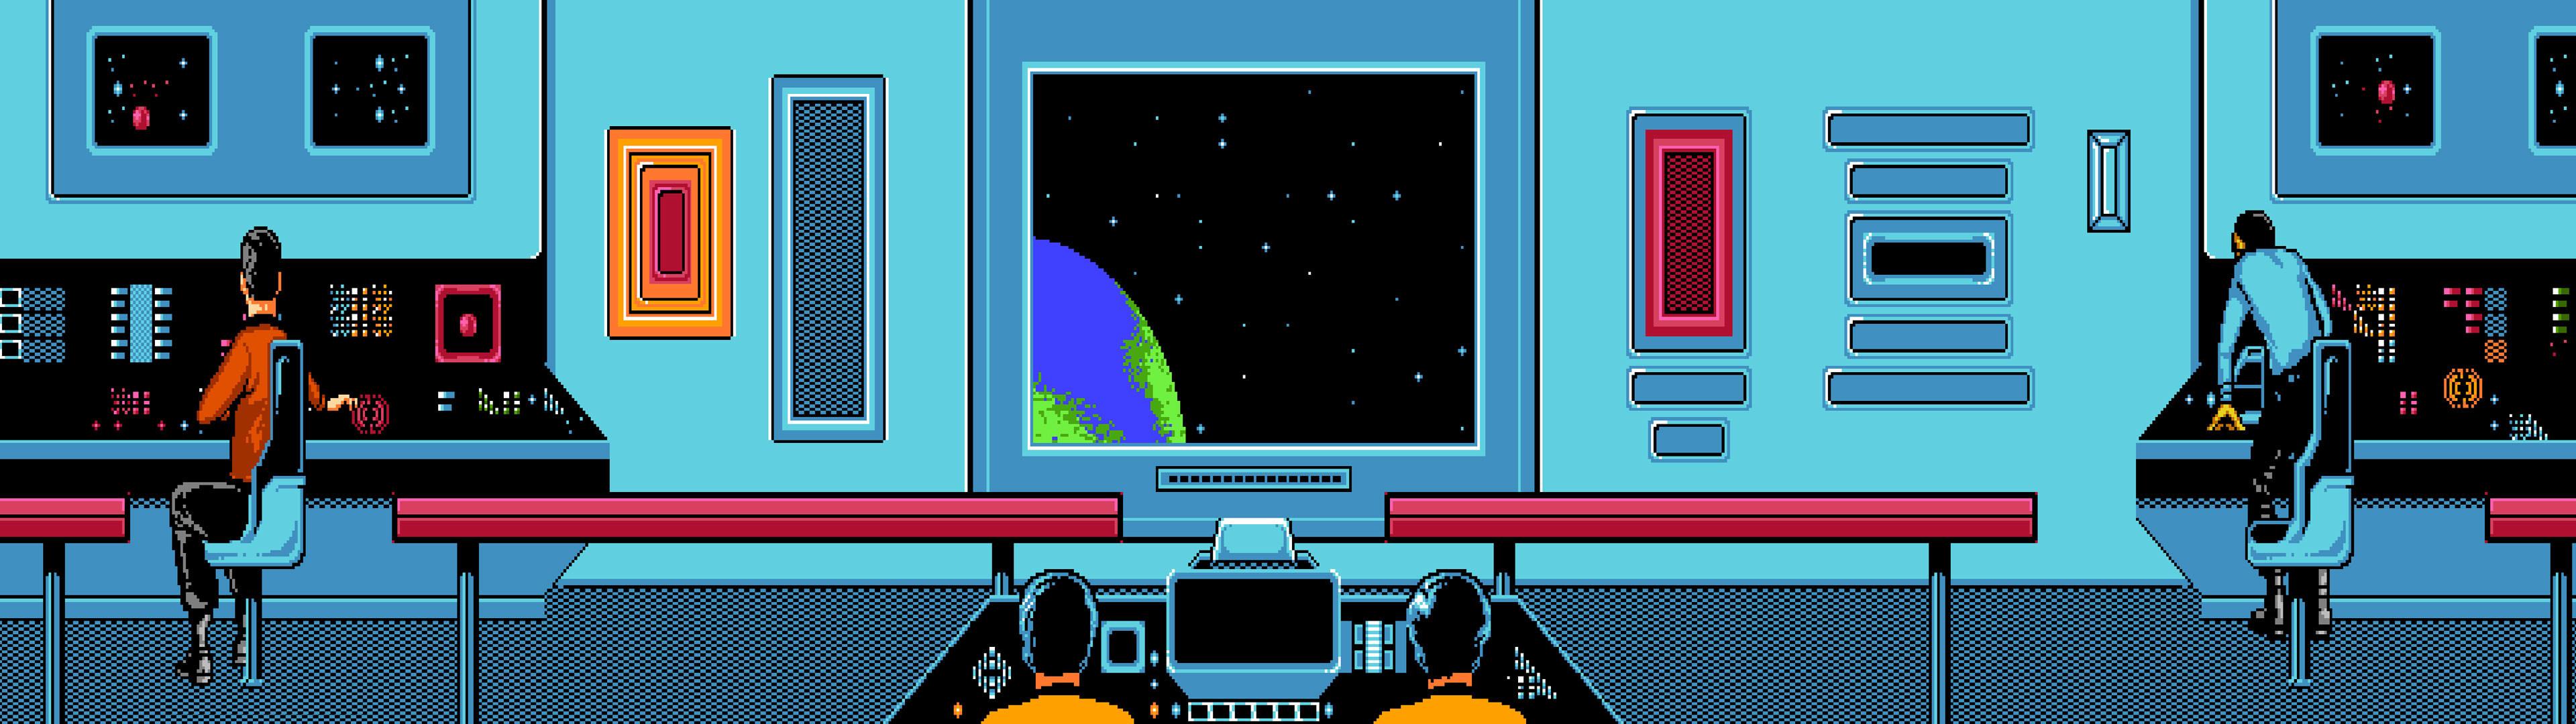 Multi Monitor Dual Screen video games retro classic sci fi science  spaceship spacecrafts wallpaper | | 32641 | WallpaperUP